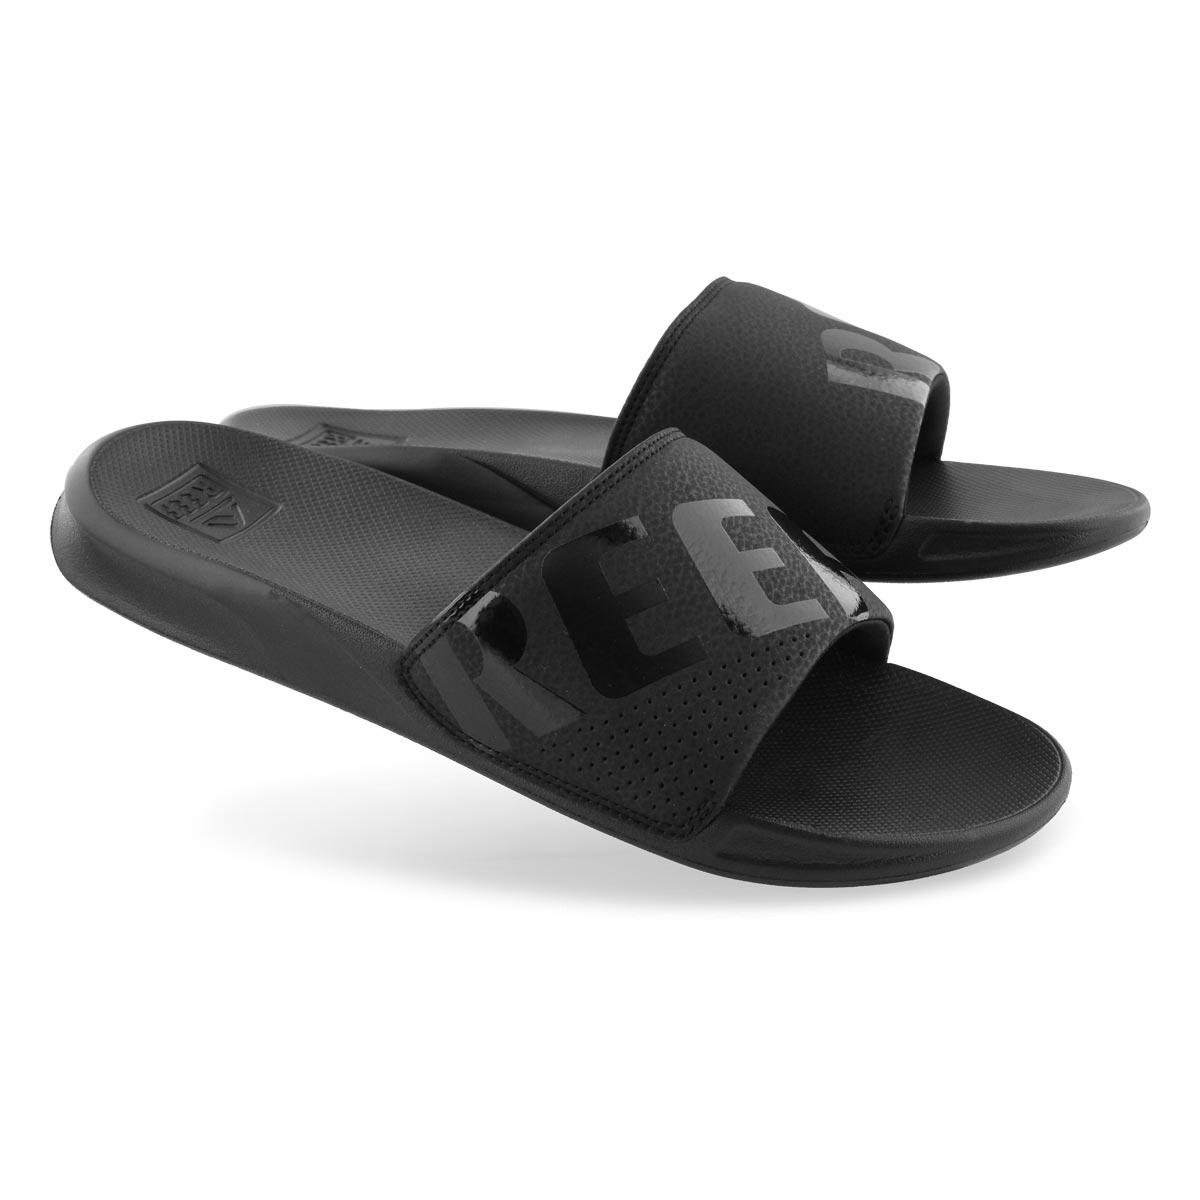 63fc5f83dbc2f Reef Men's REEF ONE all black slide sandals | Softmoc.com